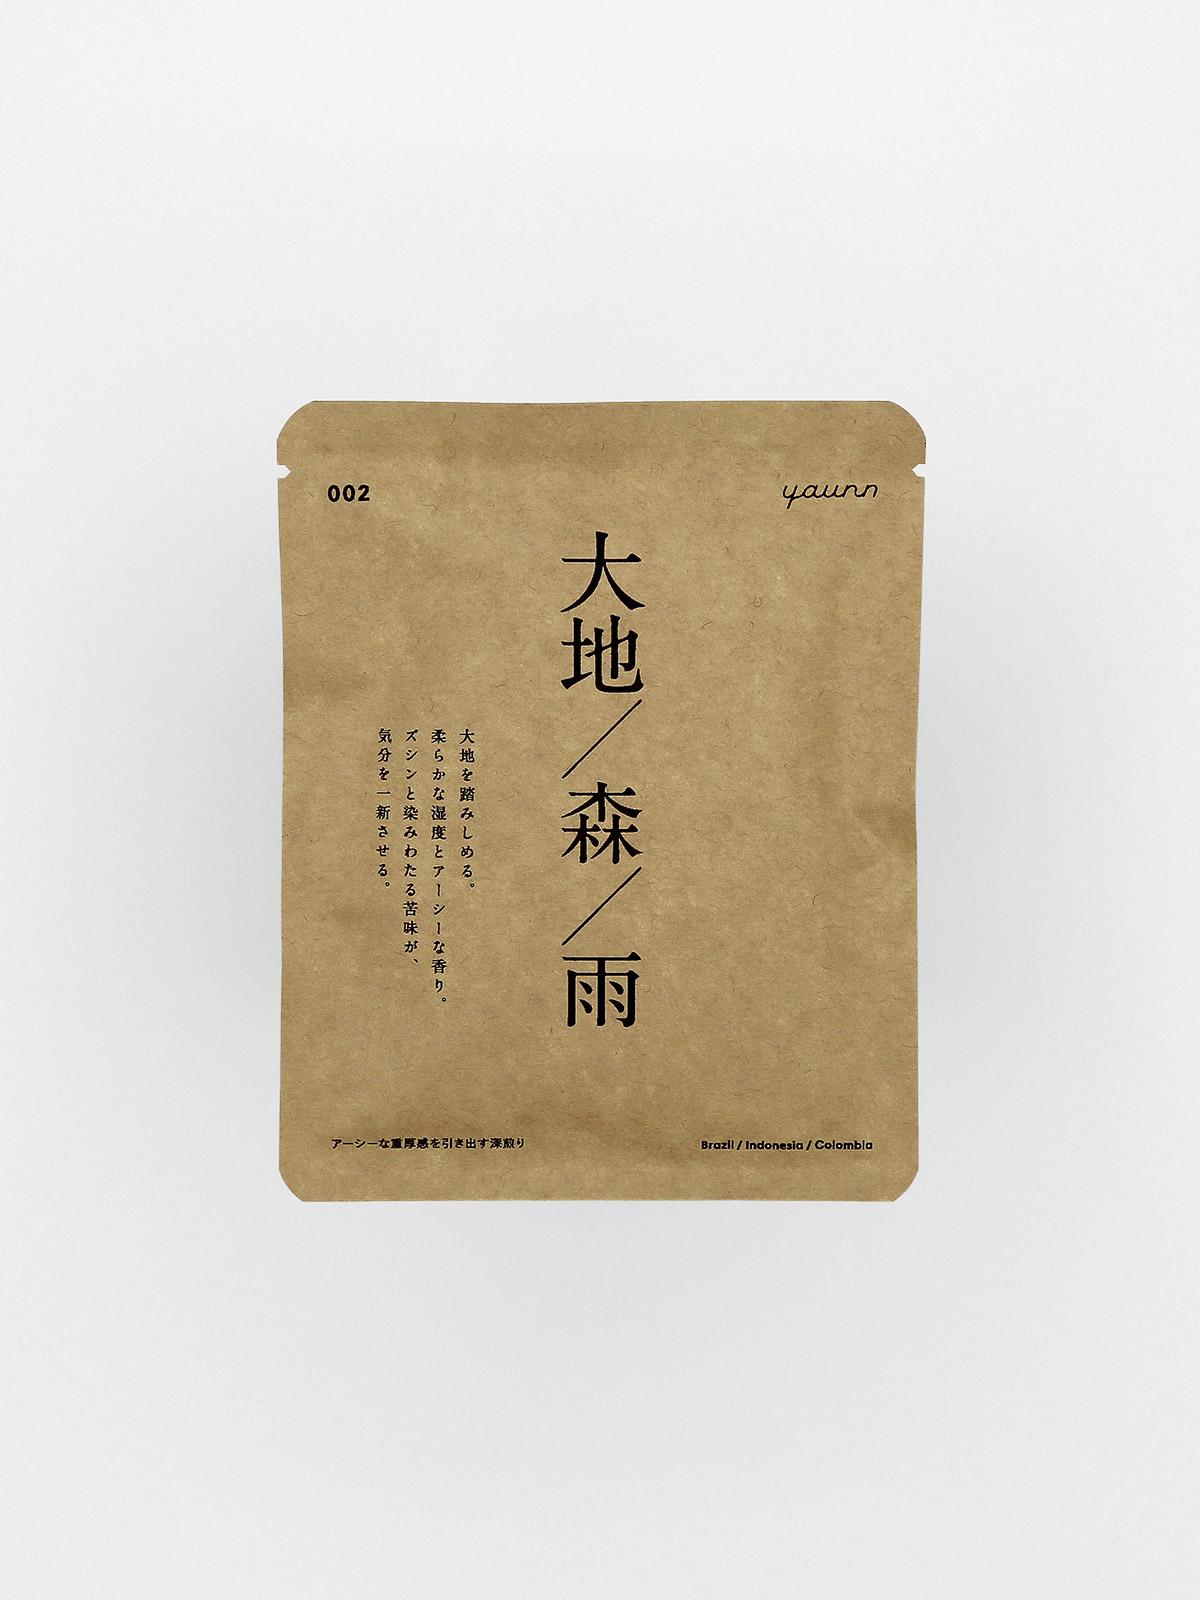 yaunn 珈琲ドリップバッグ 森の青空と大地セット 6pcs Roasted by 軽井沢コーヒーカンパニー(送料無料)